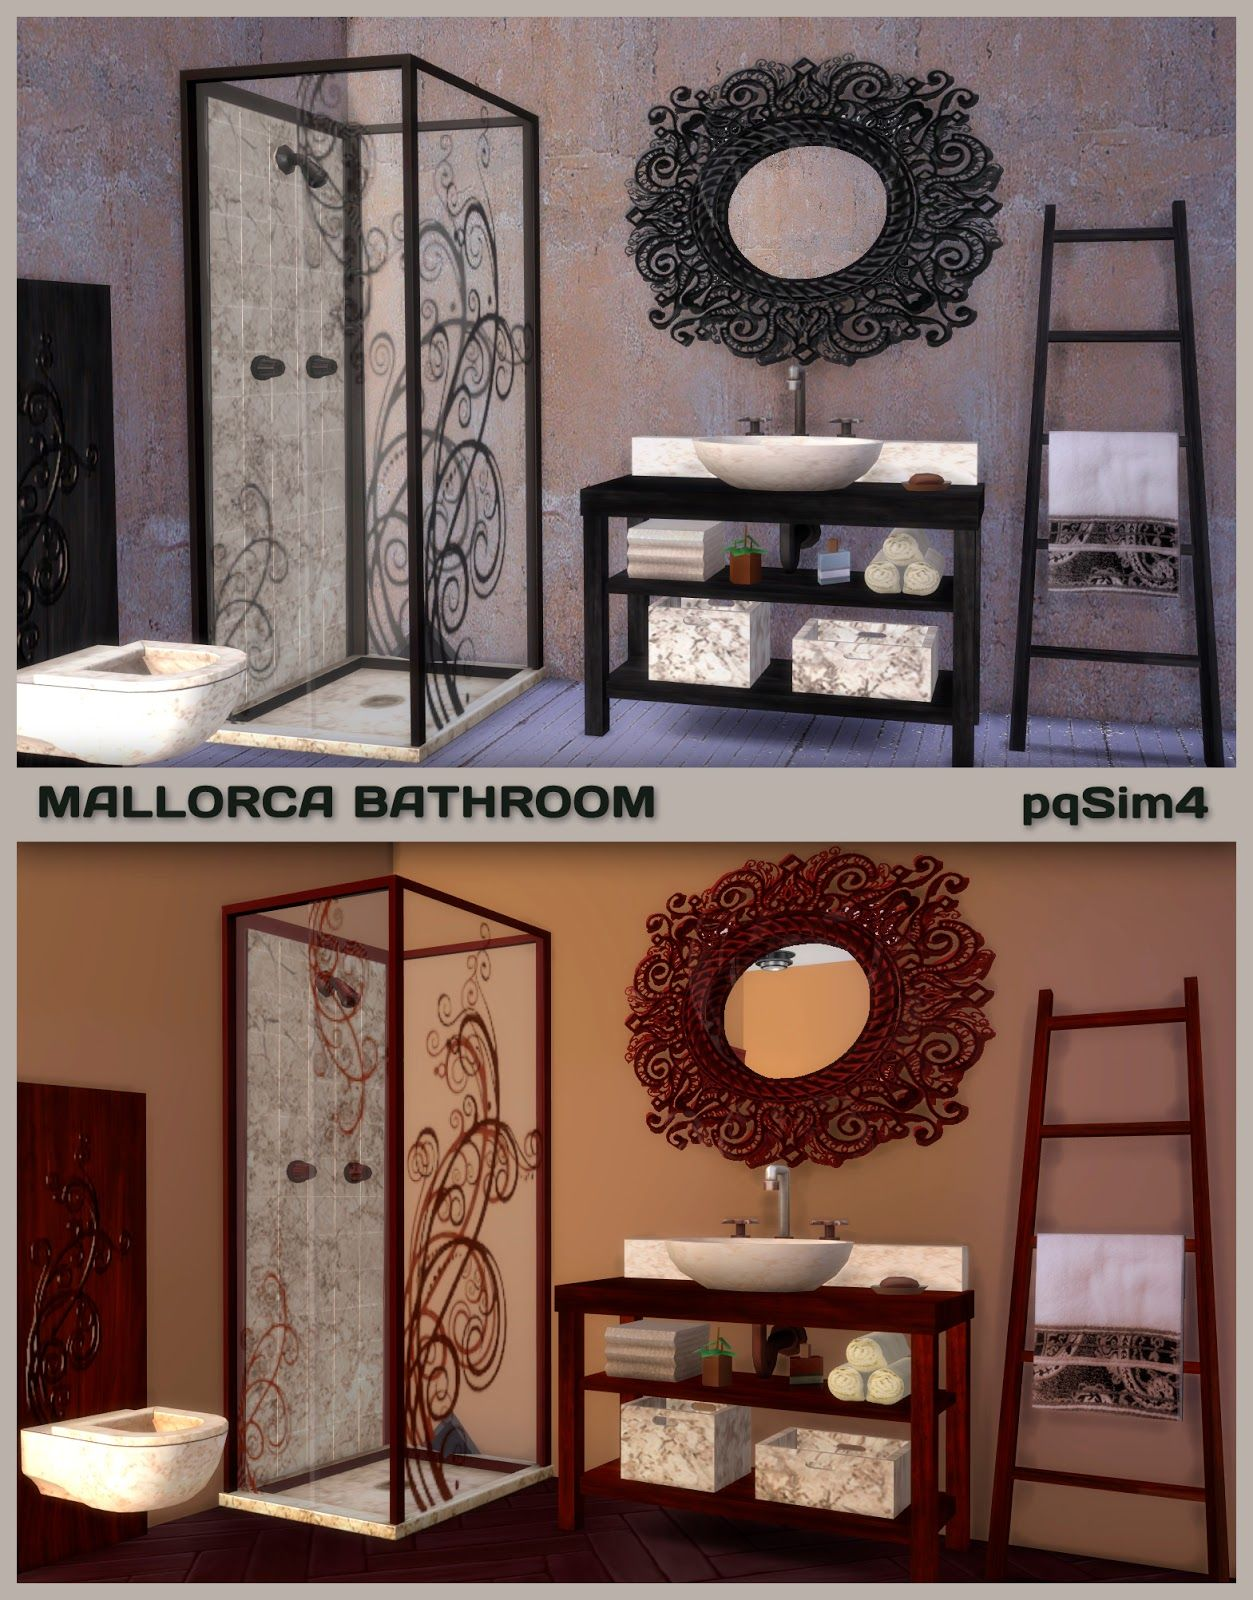 sims 4 cc s the best bathroom martika by pqsim4 sims 4 cc s